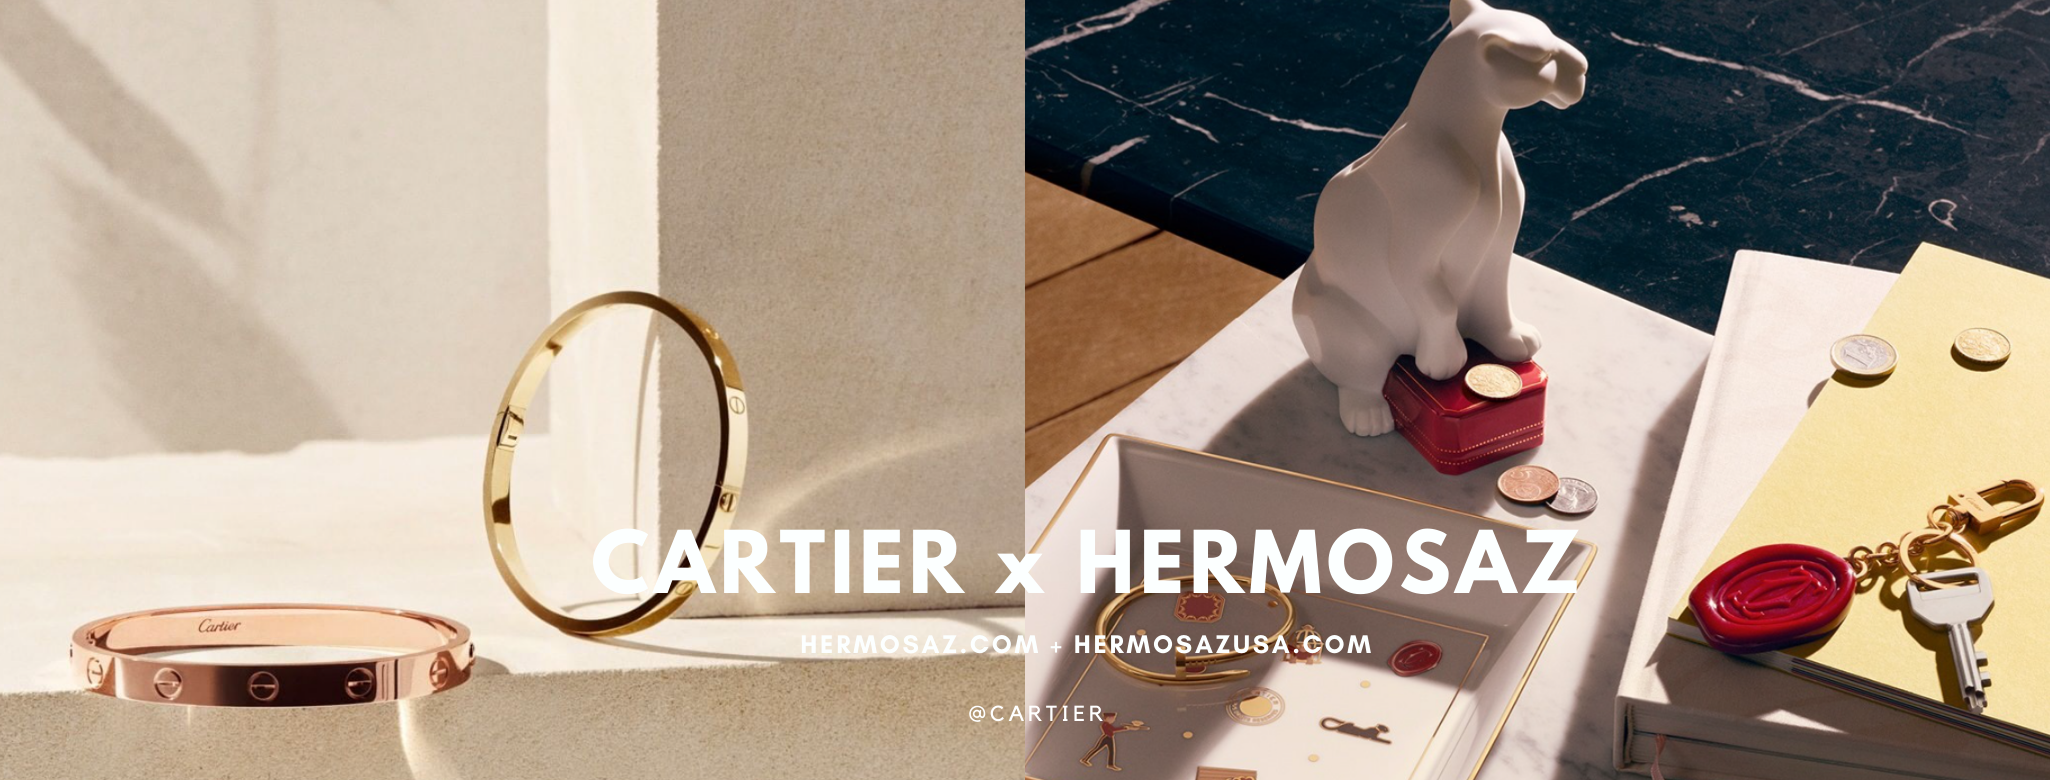 Cartier x Hermosaz